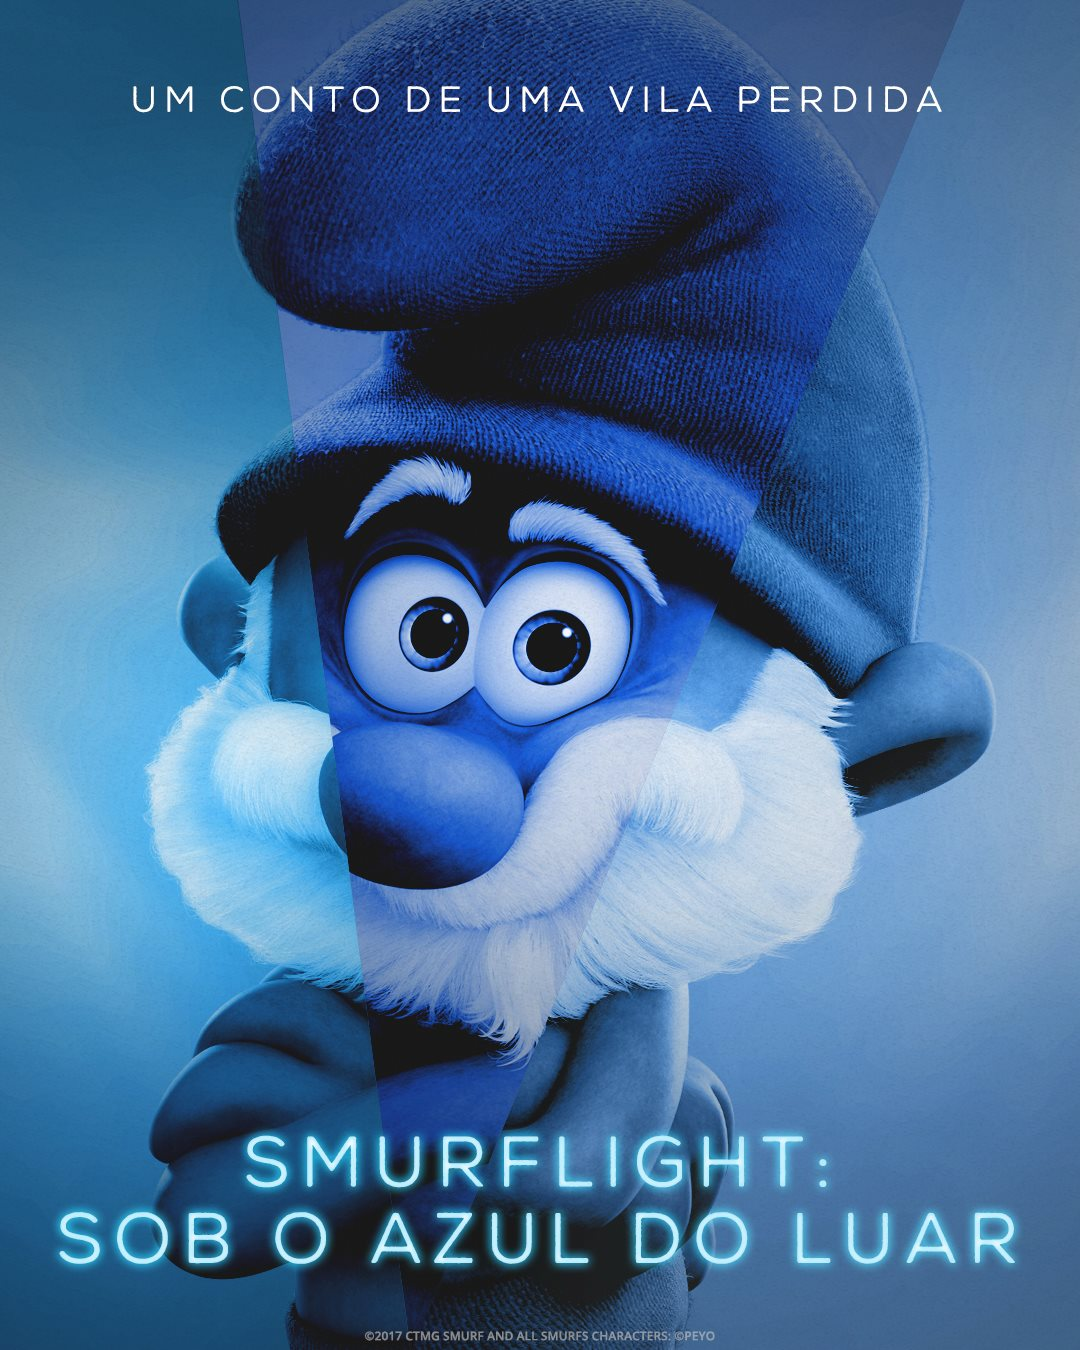 Smurfs_Oscar_02